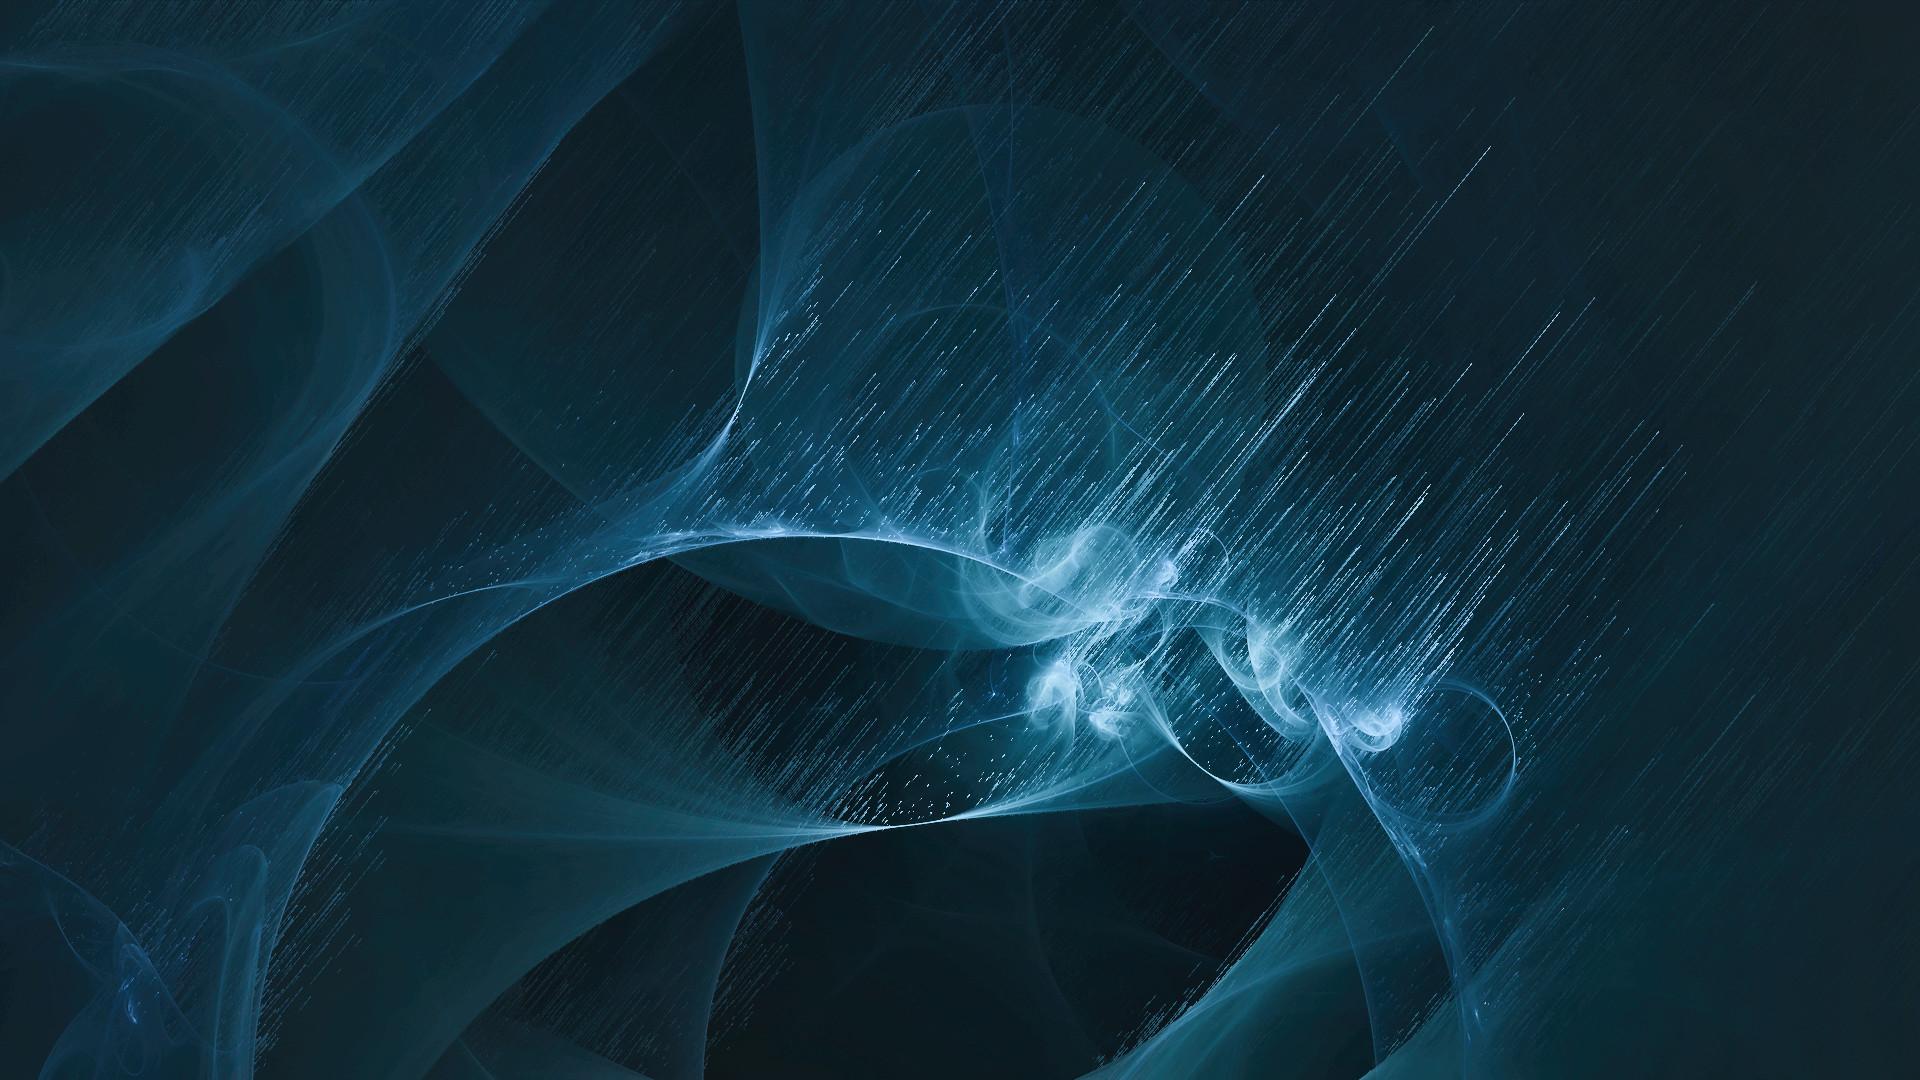 Kresimir jelusic robob3ar fractal rain 1